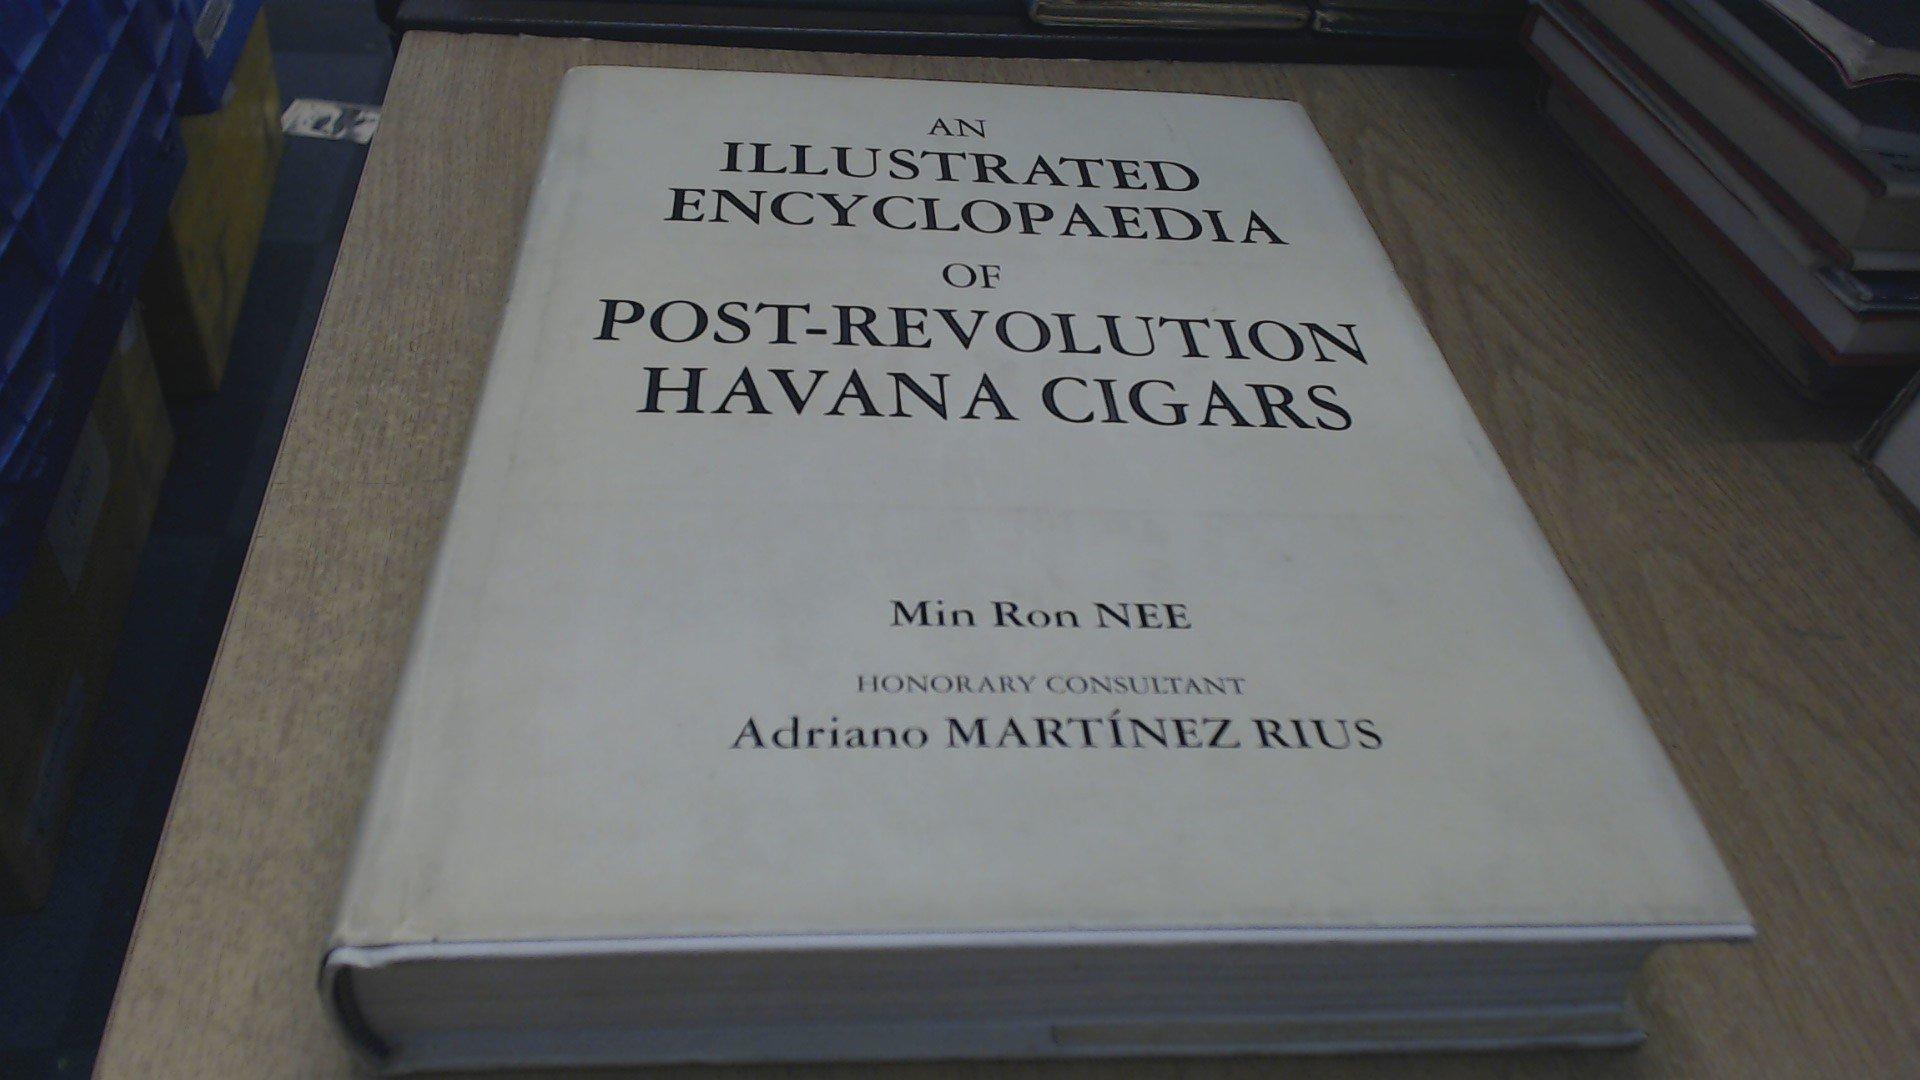 An Illustrated Encyclopaedia of Post-revolution Havana Cigars ...